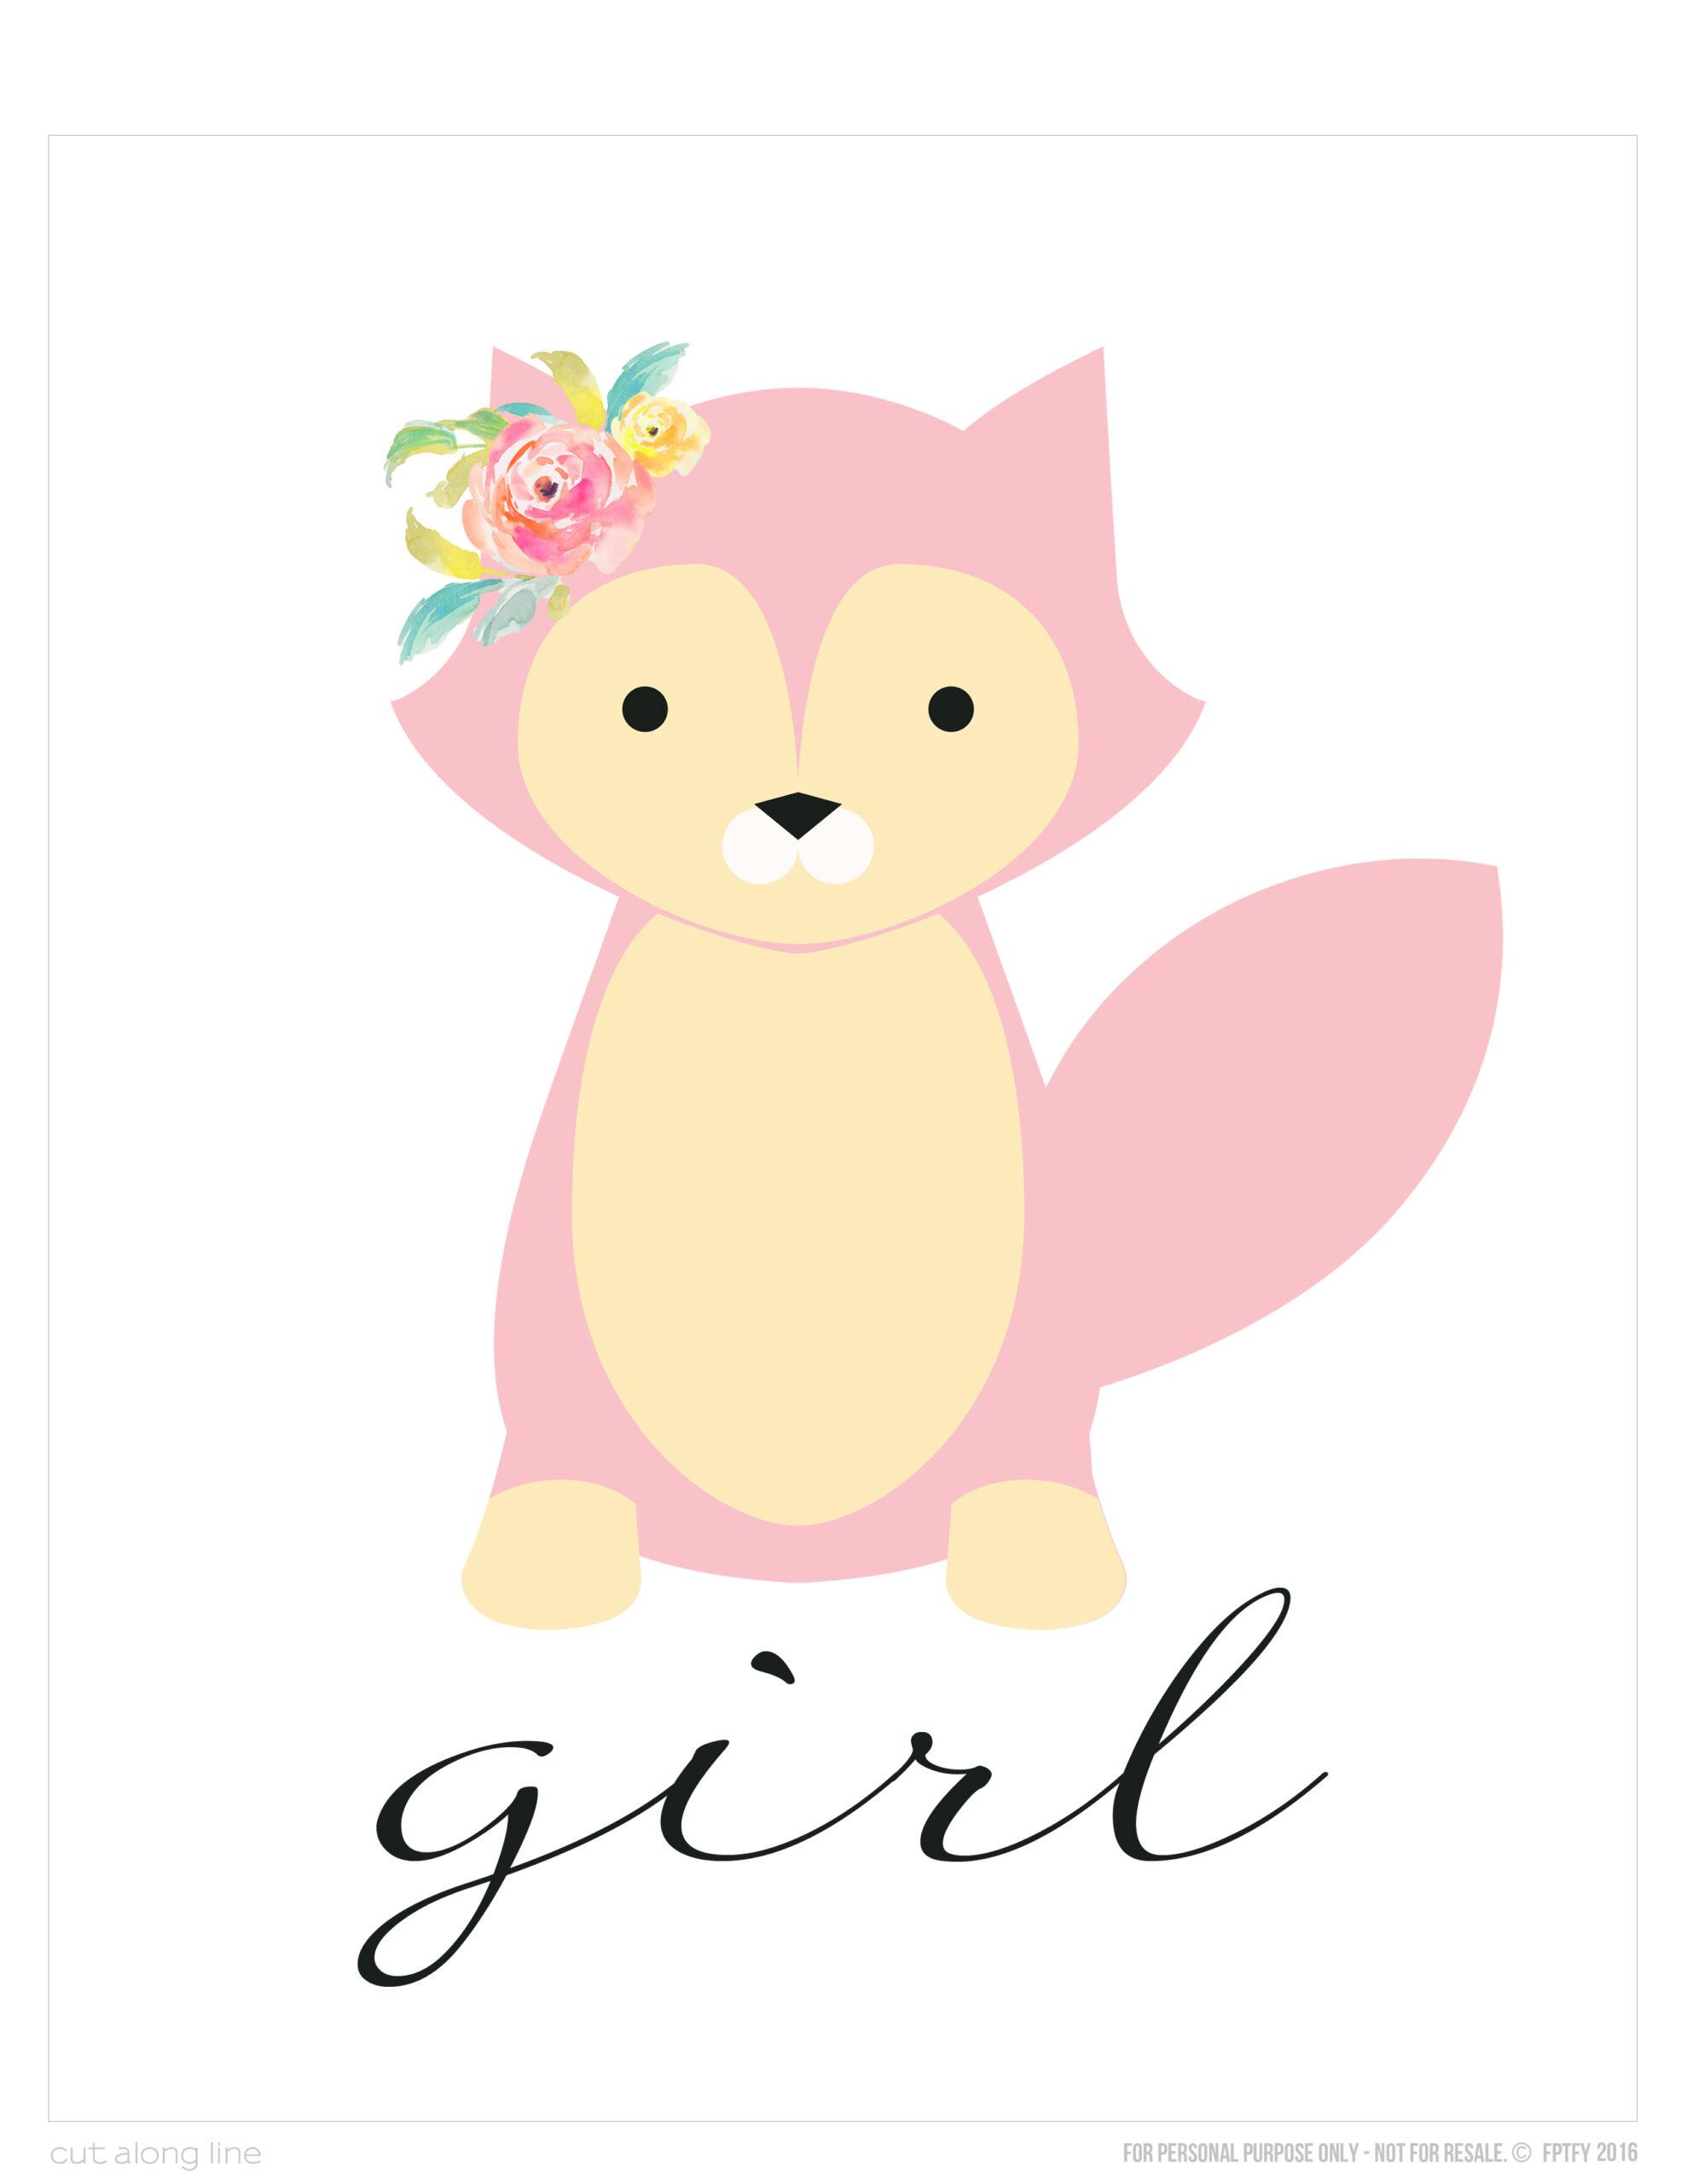 Wall Art- Free Foxy Girl 8x10 Print - Free Pretty Things For You